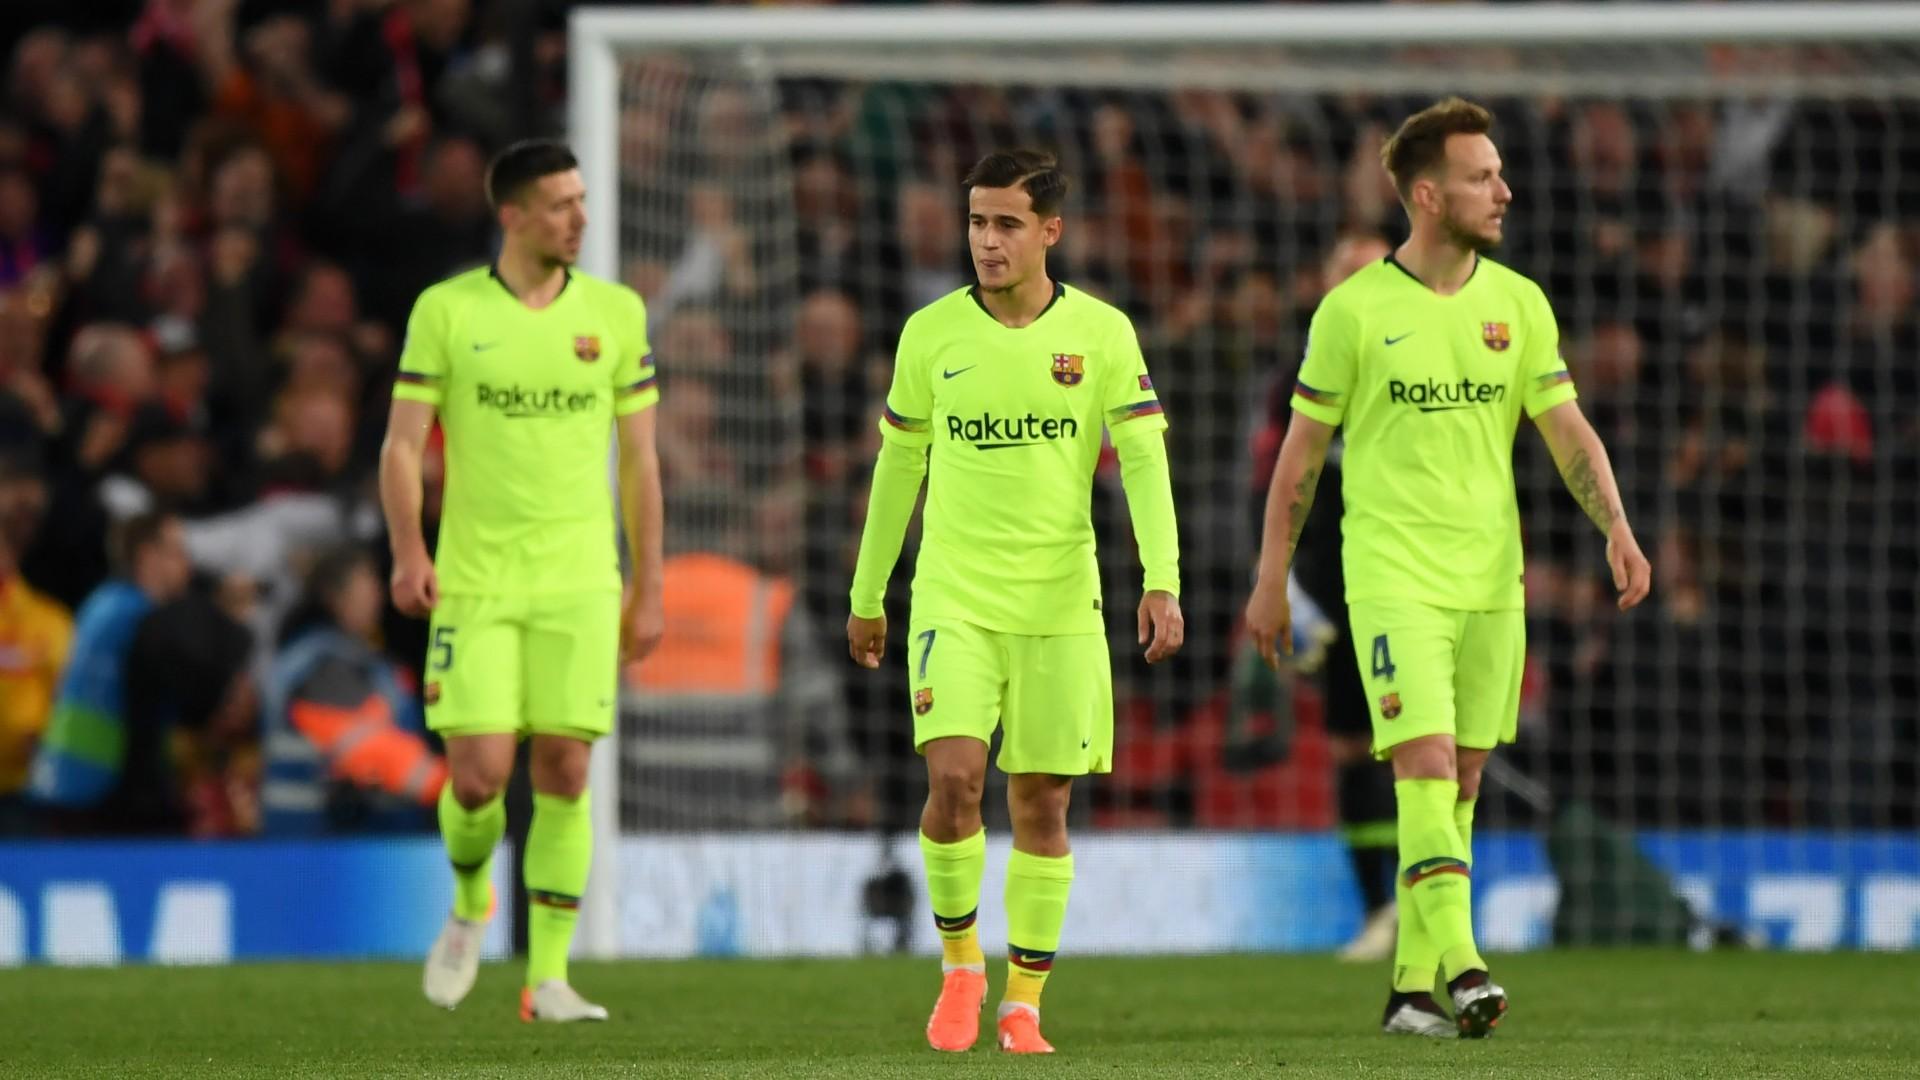 De Ligt al Barcellona, annuncio in arrivo: all'Ajax 70 milioni